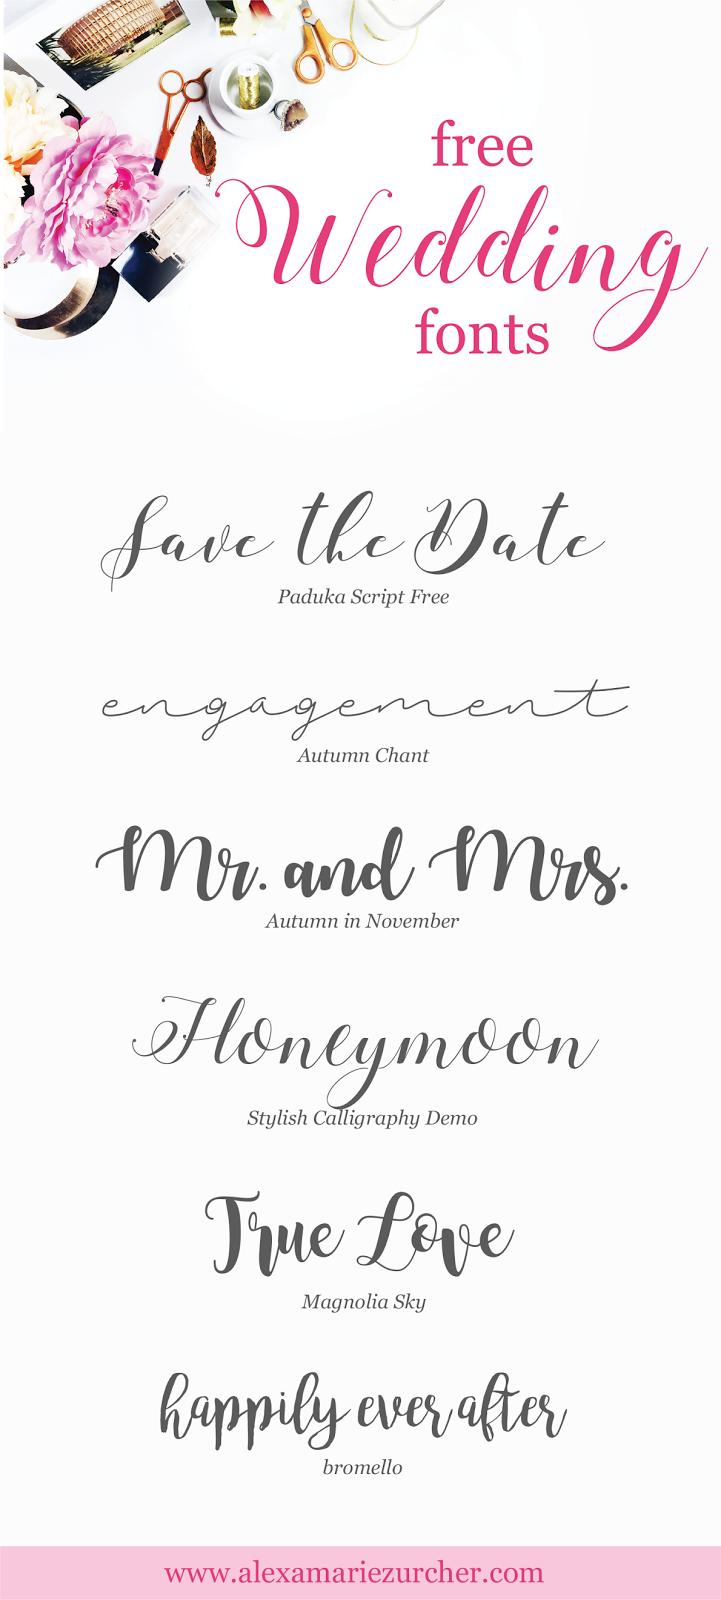 Free Wedding Fonts Free Calligraphy Fonts Free Script Fonts